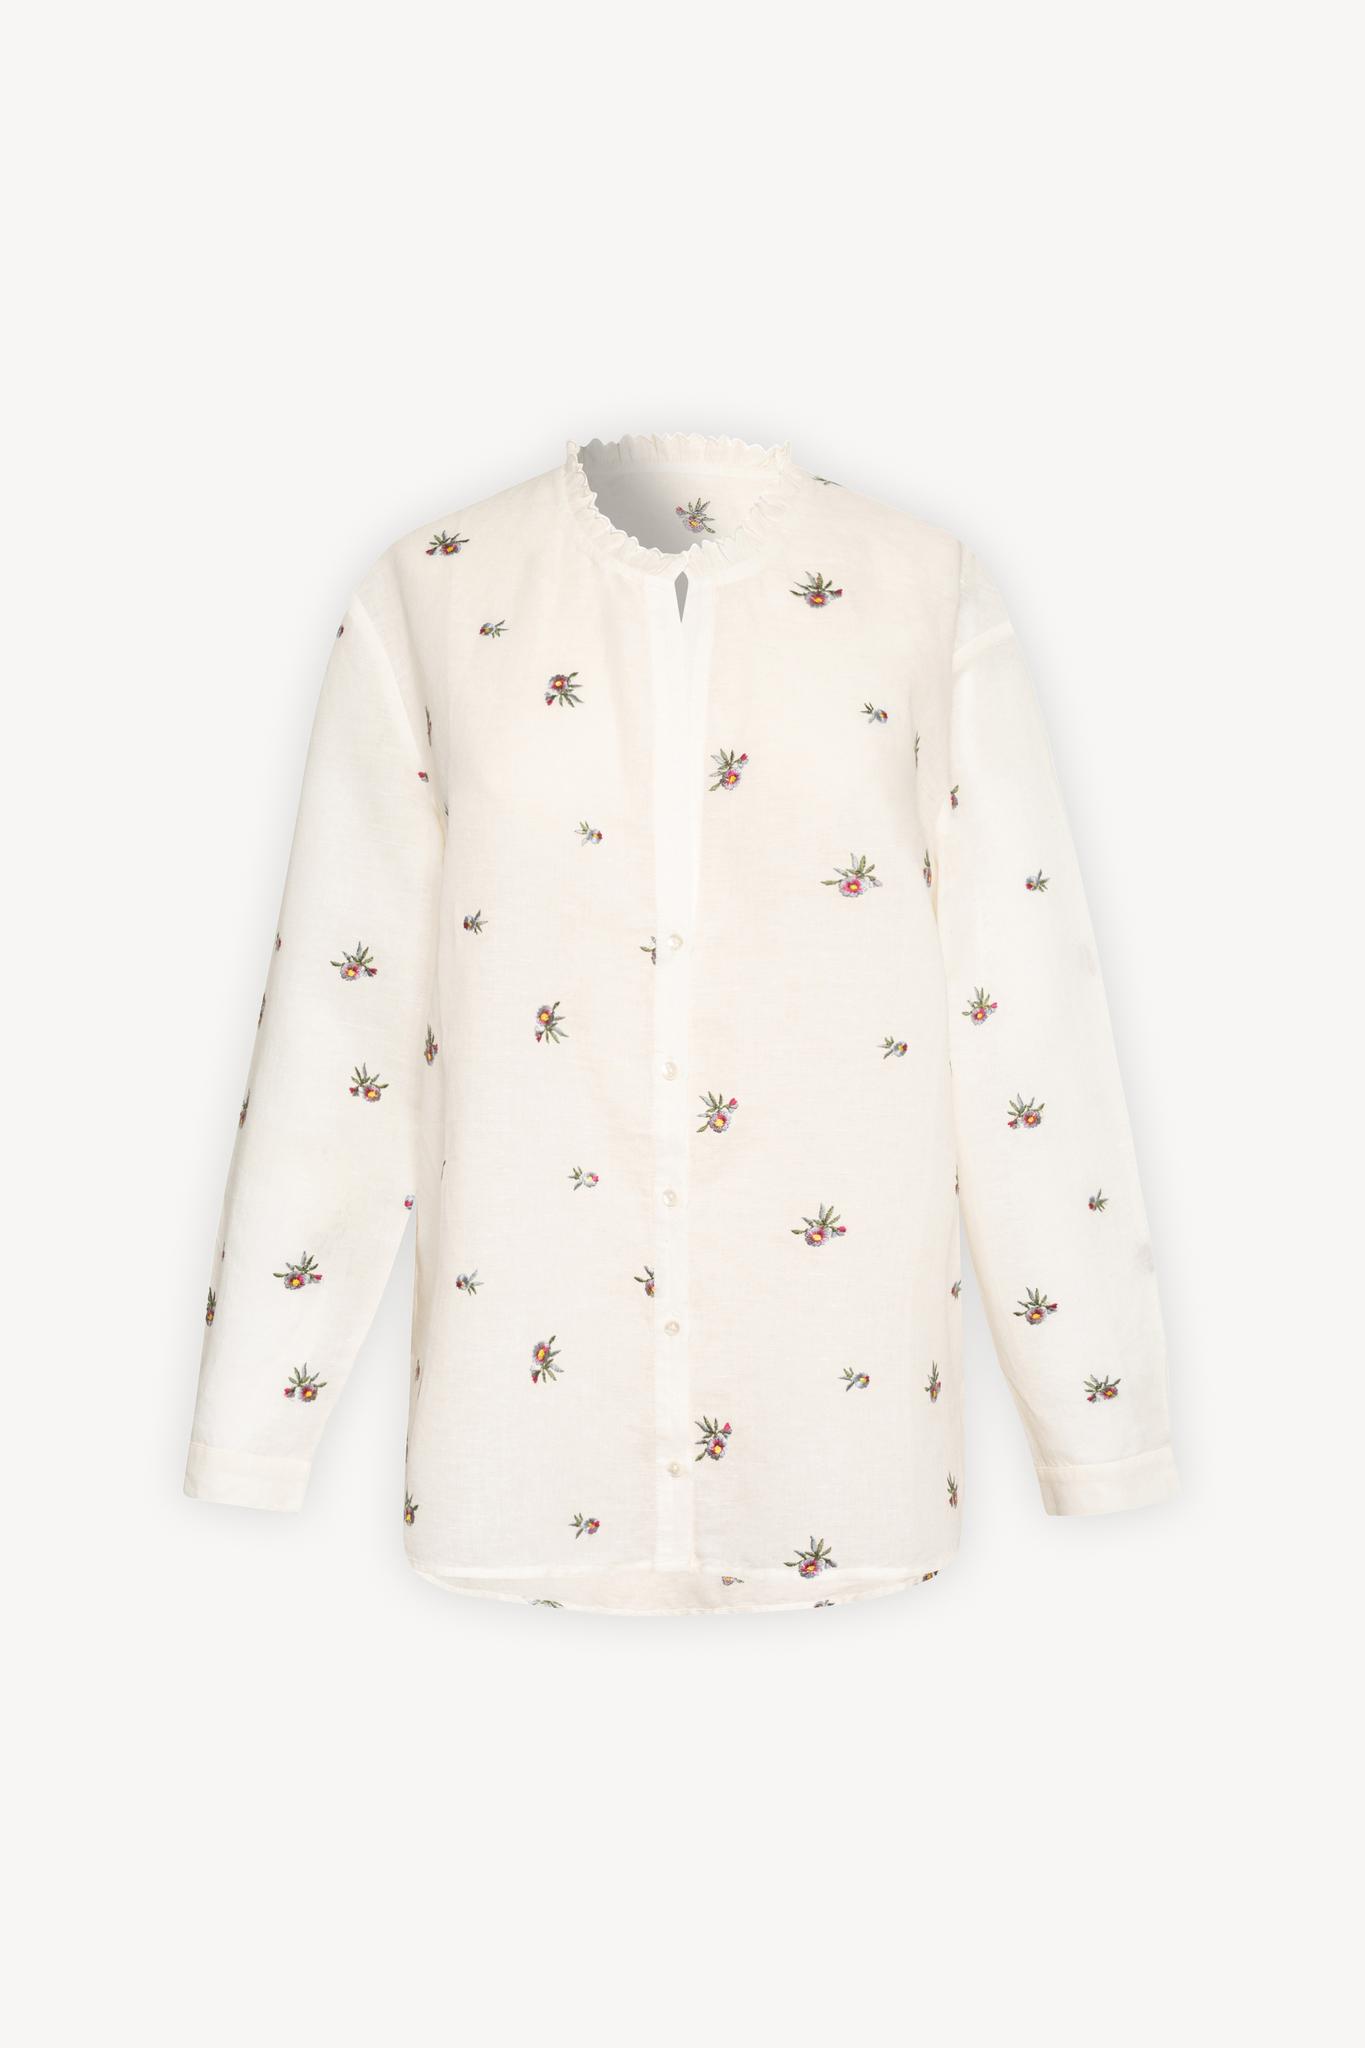 NEHEMIA - Блуза из хлопка и льна с вышивкой